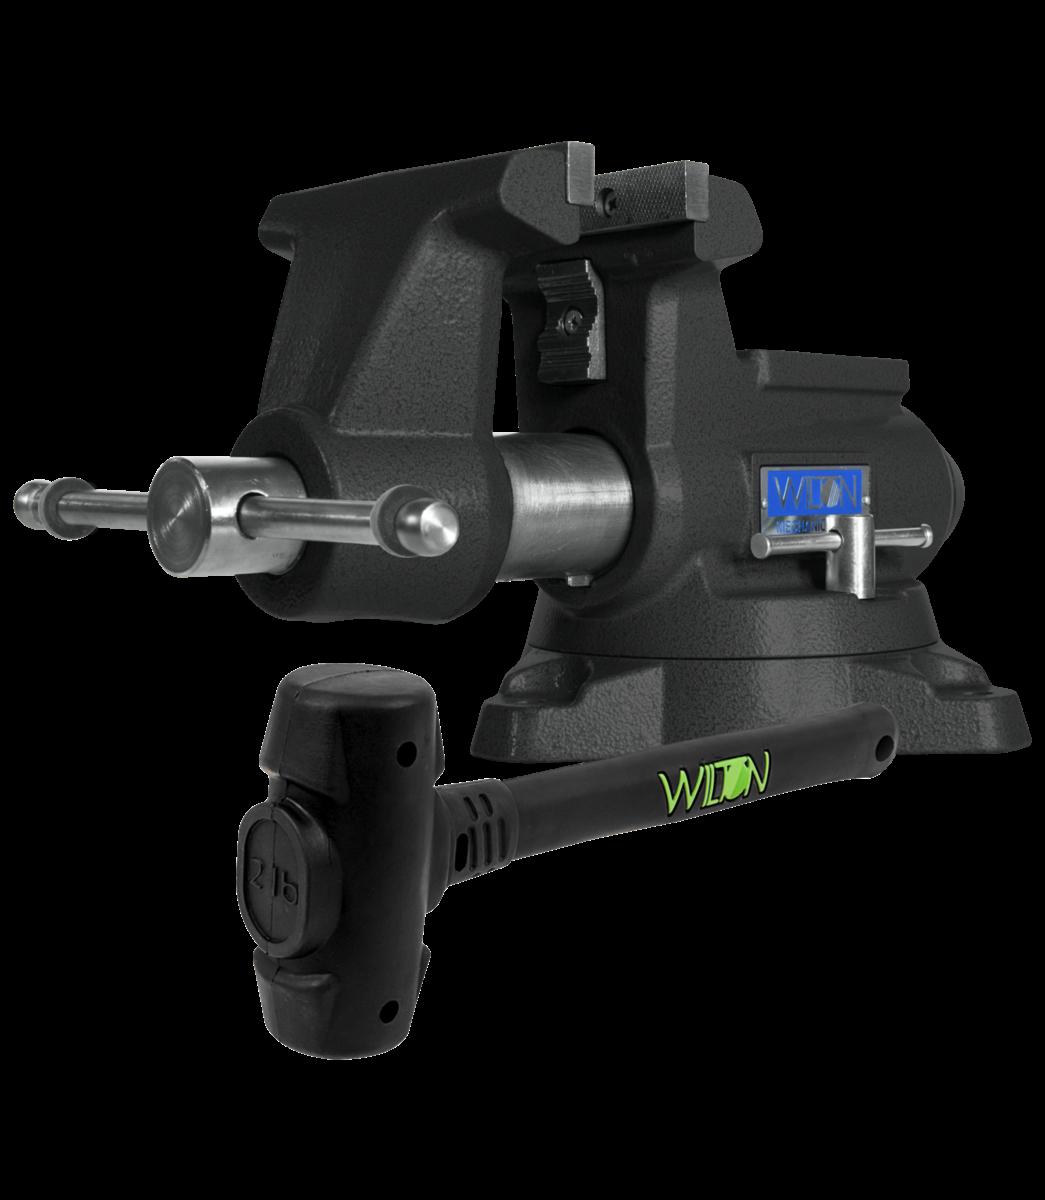 Manual: Special Edition Black 855M Mechanics Pro Vise incl. a free 2 lb B.A.S.H. Dead Blow Hammer